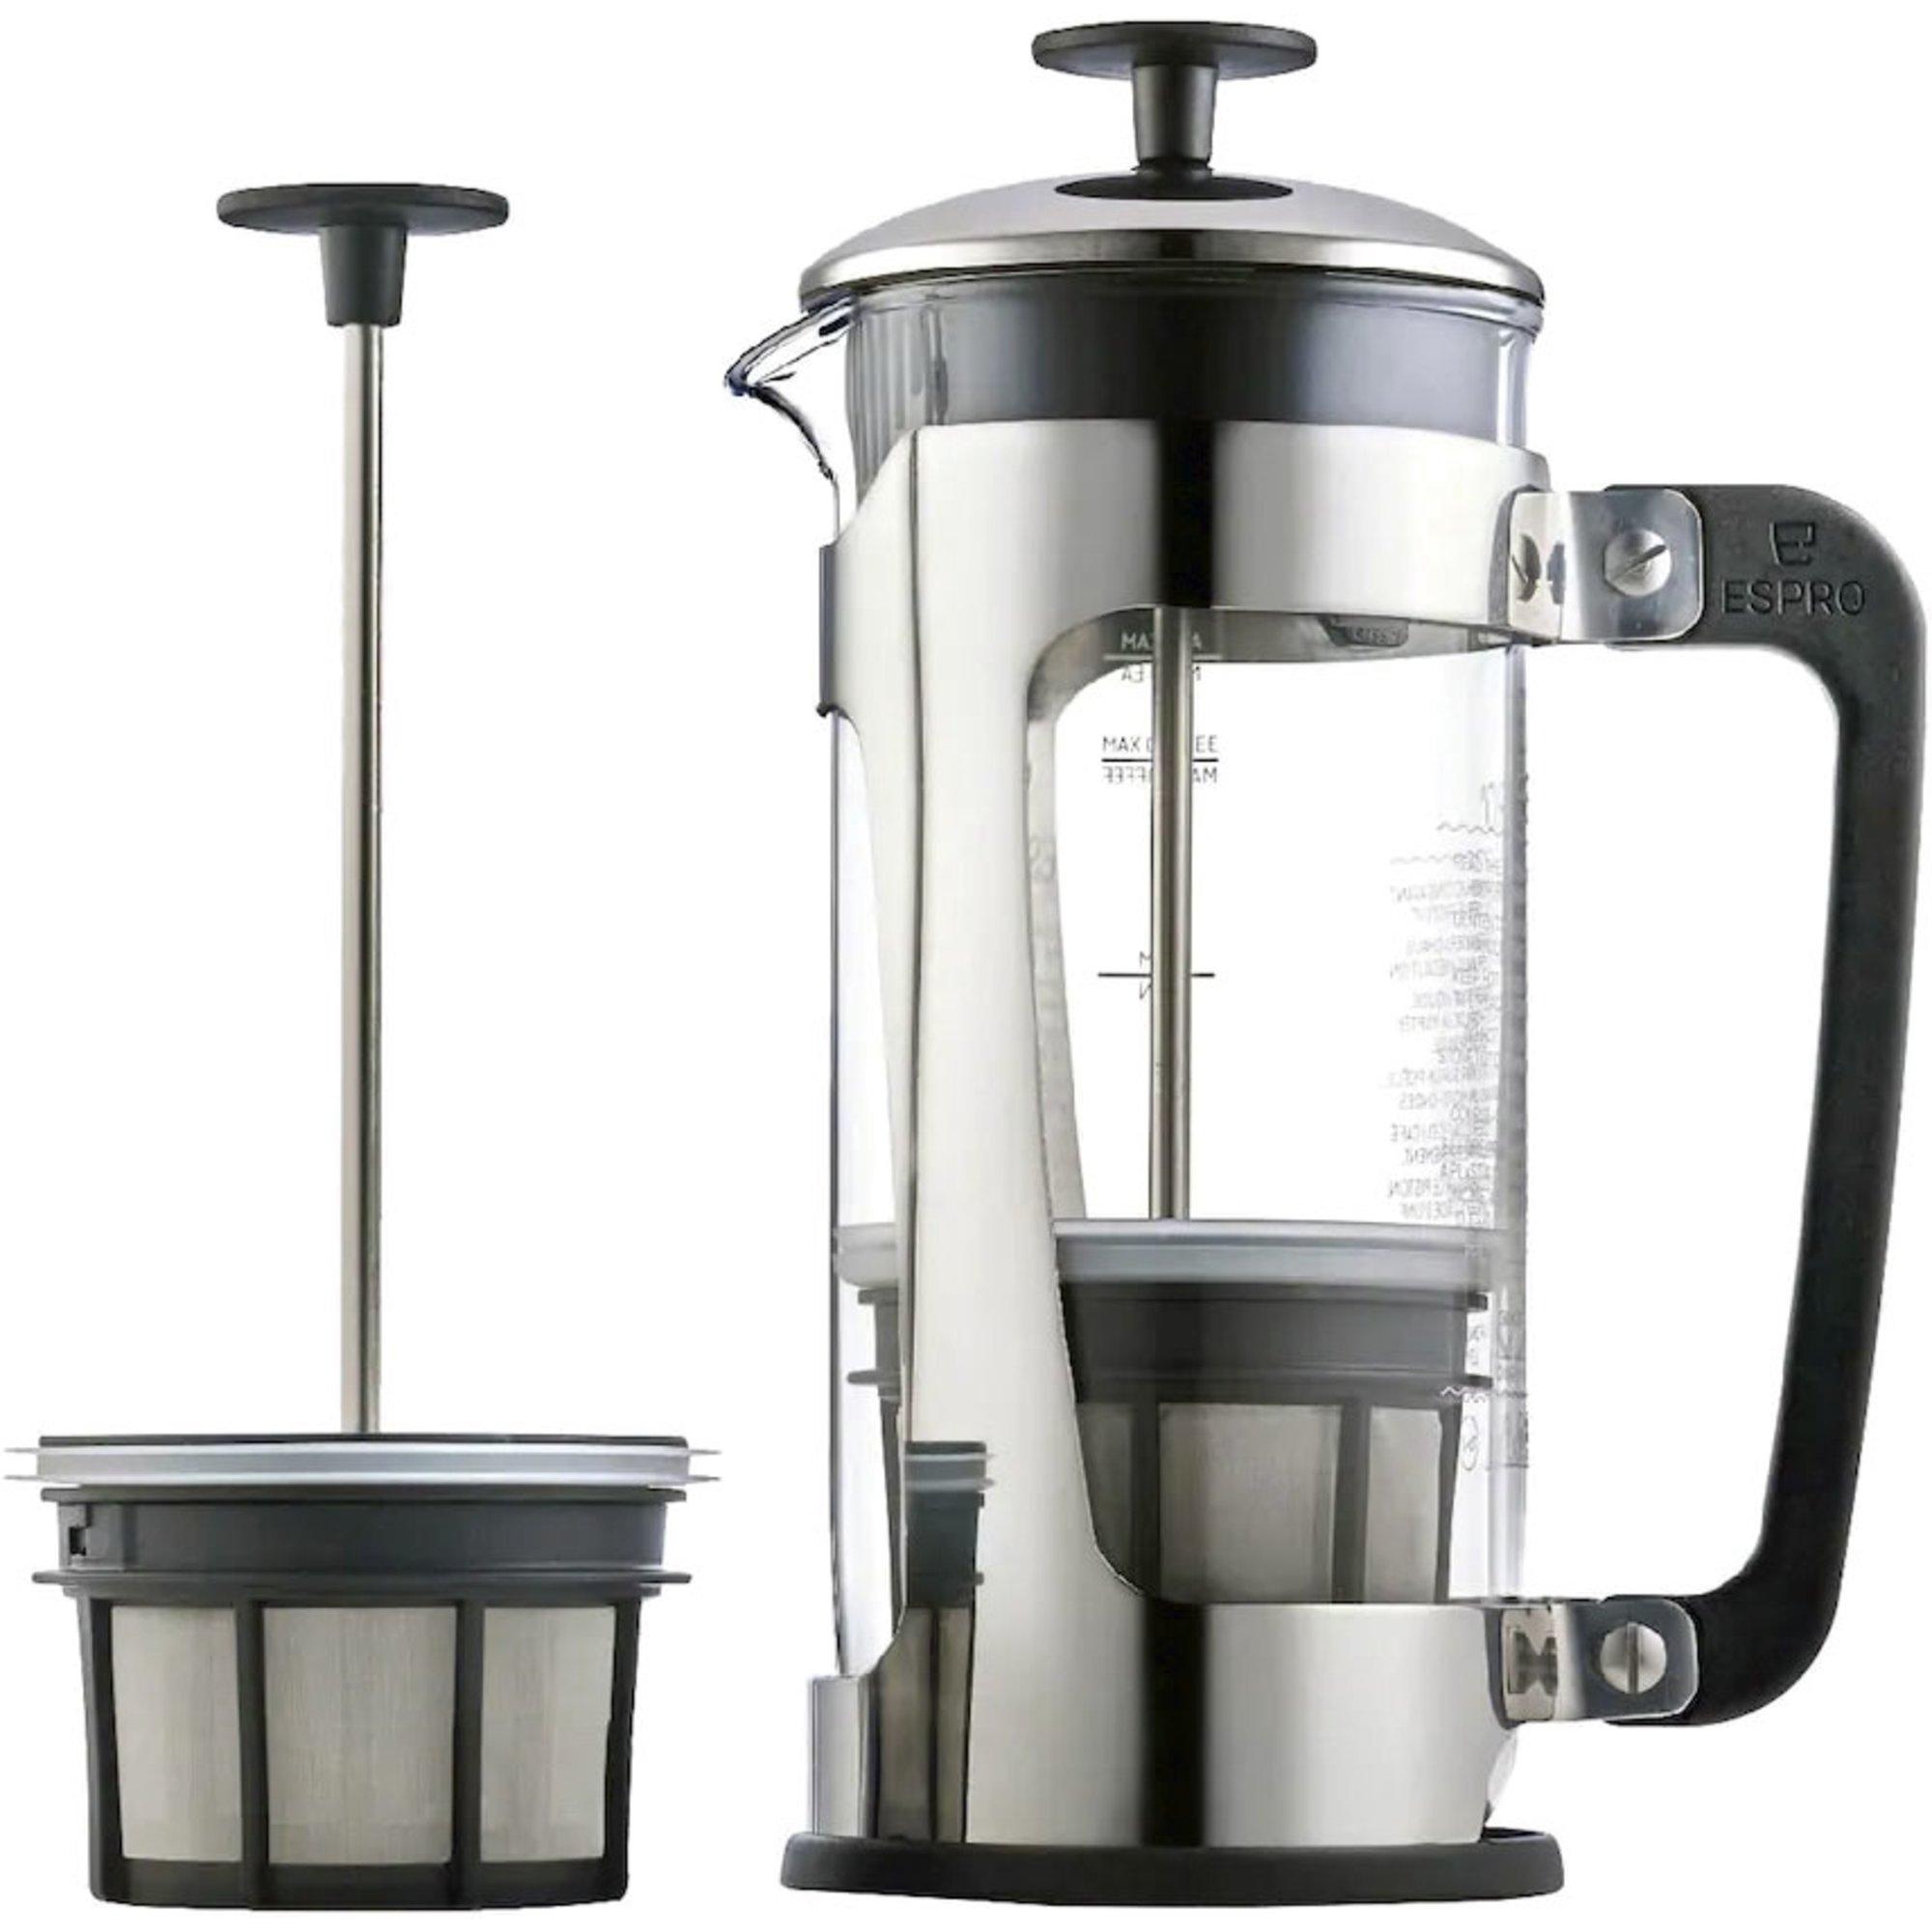 Espro P5 1218C kaffepress